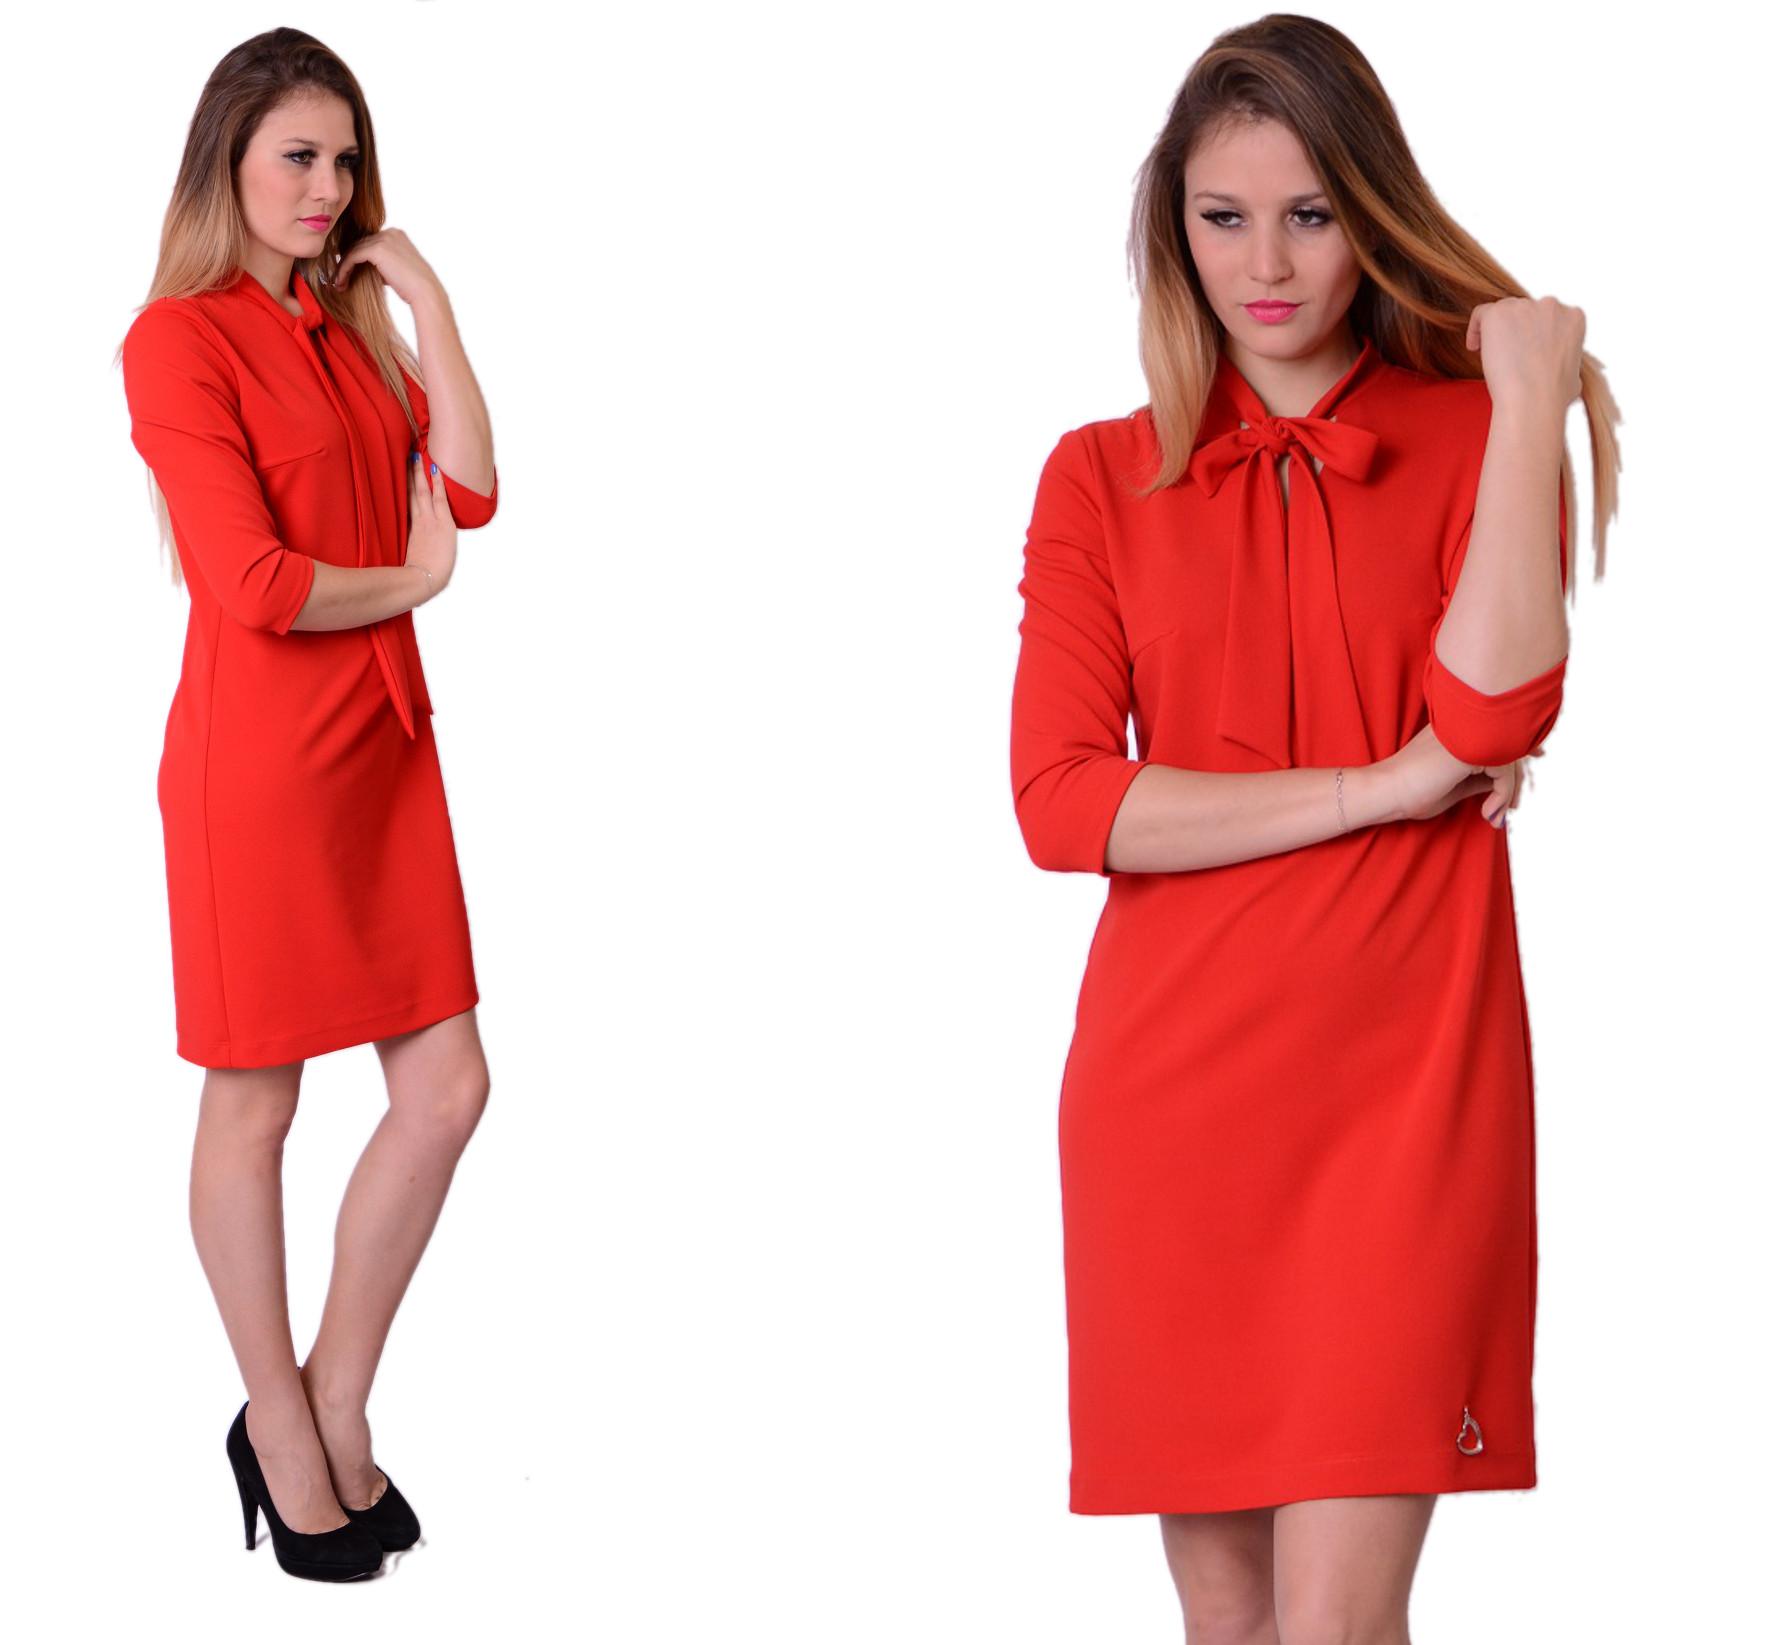 b1b8e7511e Sukienka Trapez Krawat Kolory Producent rozm.44 - 7132142773 ...